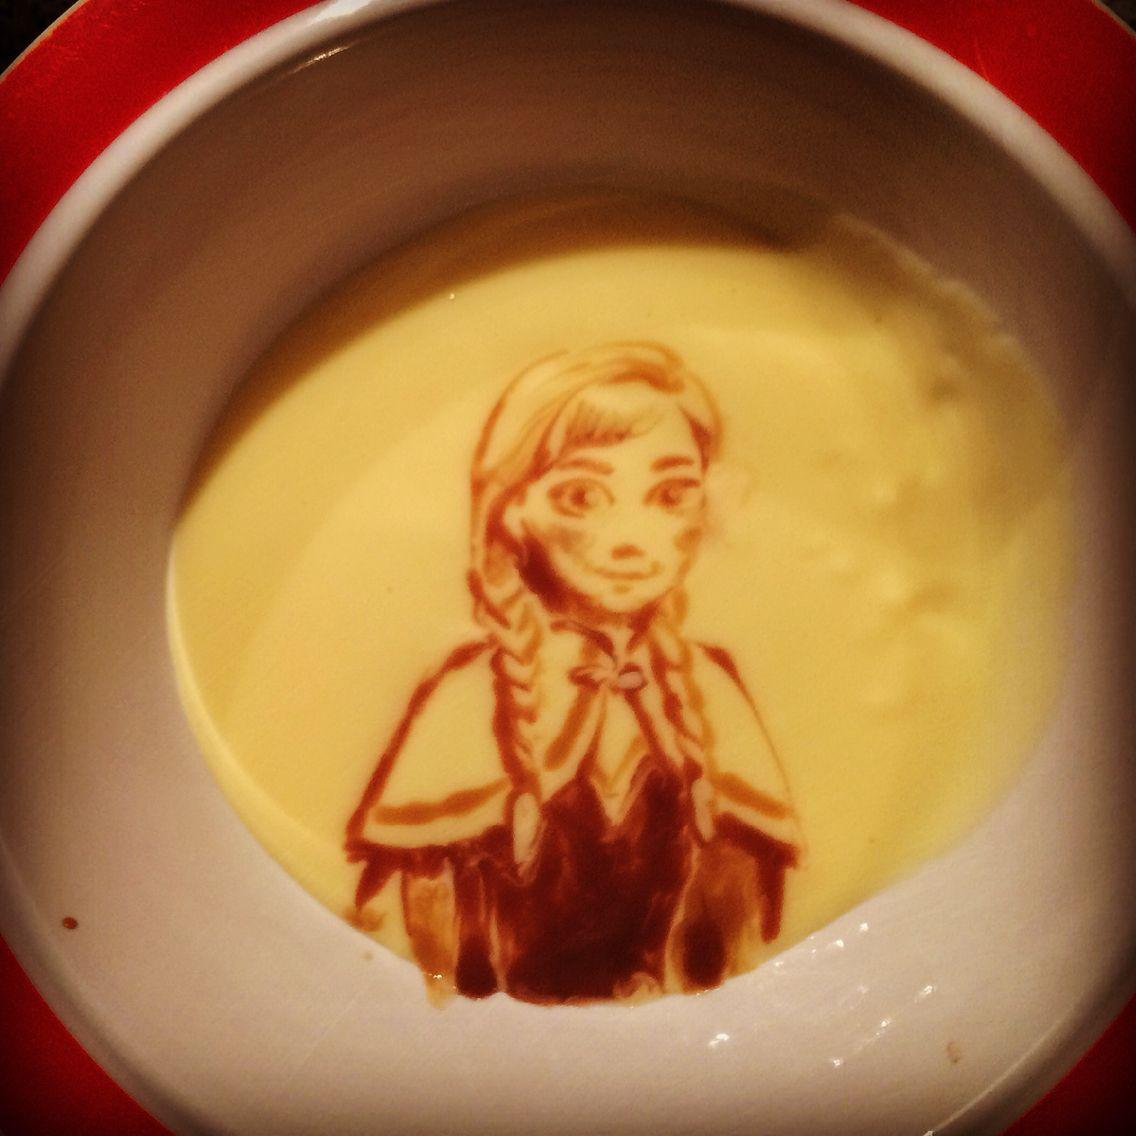 Frozen Anna in custard #foodart #vlaart Disney